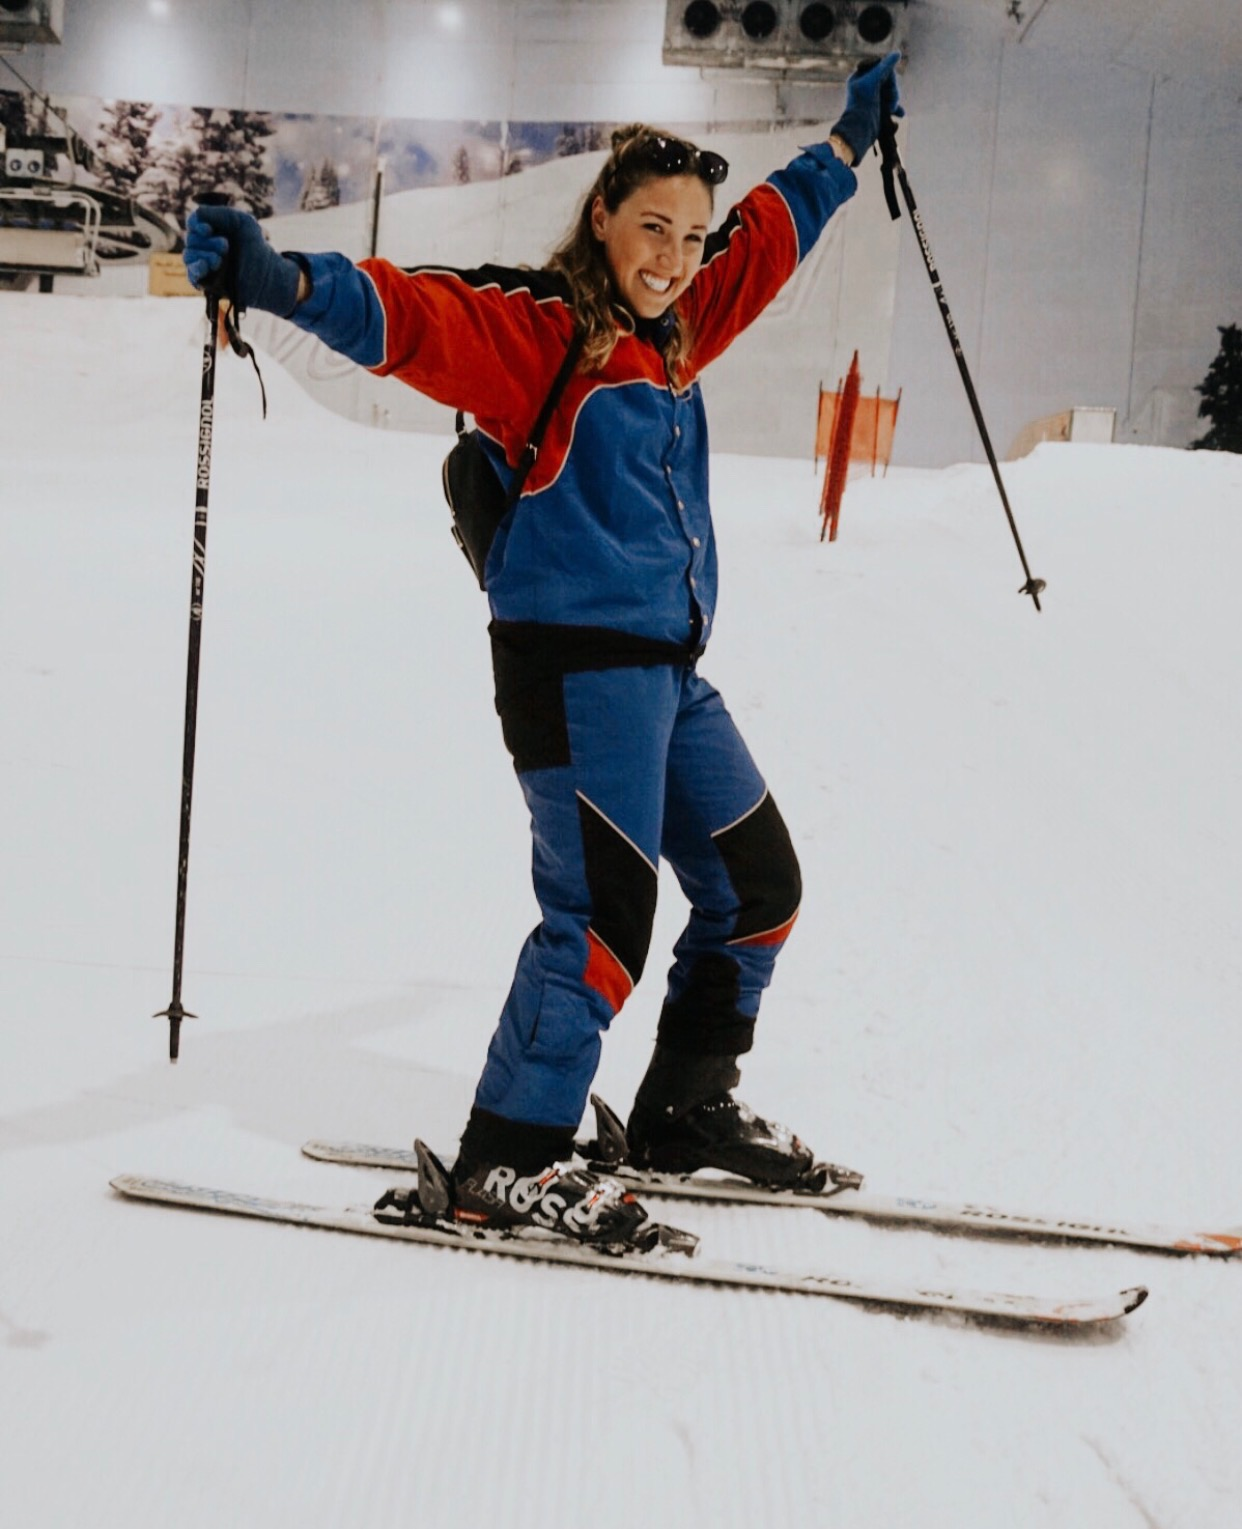 The Adventure Decade - Ski Dubai